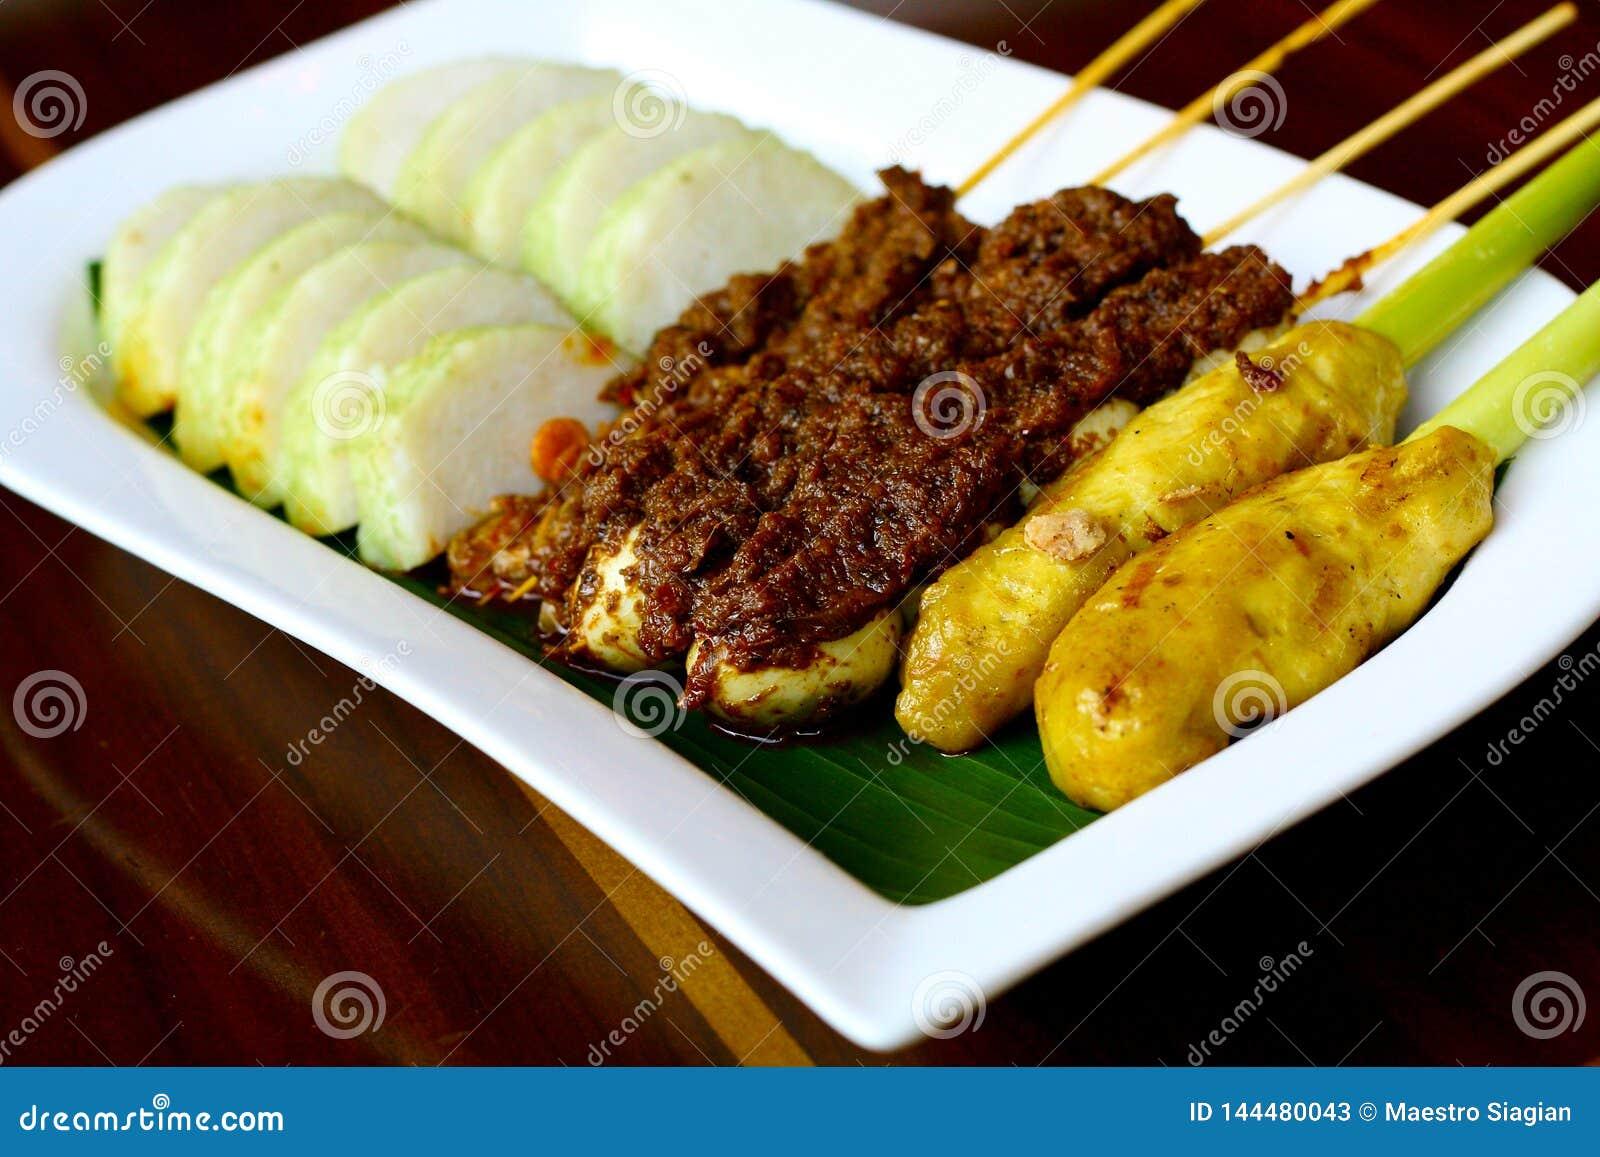 Balinese Satay